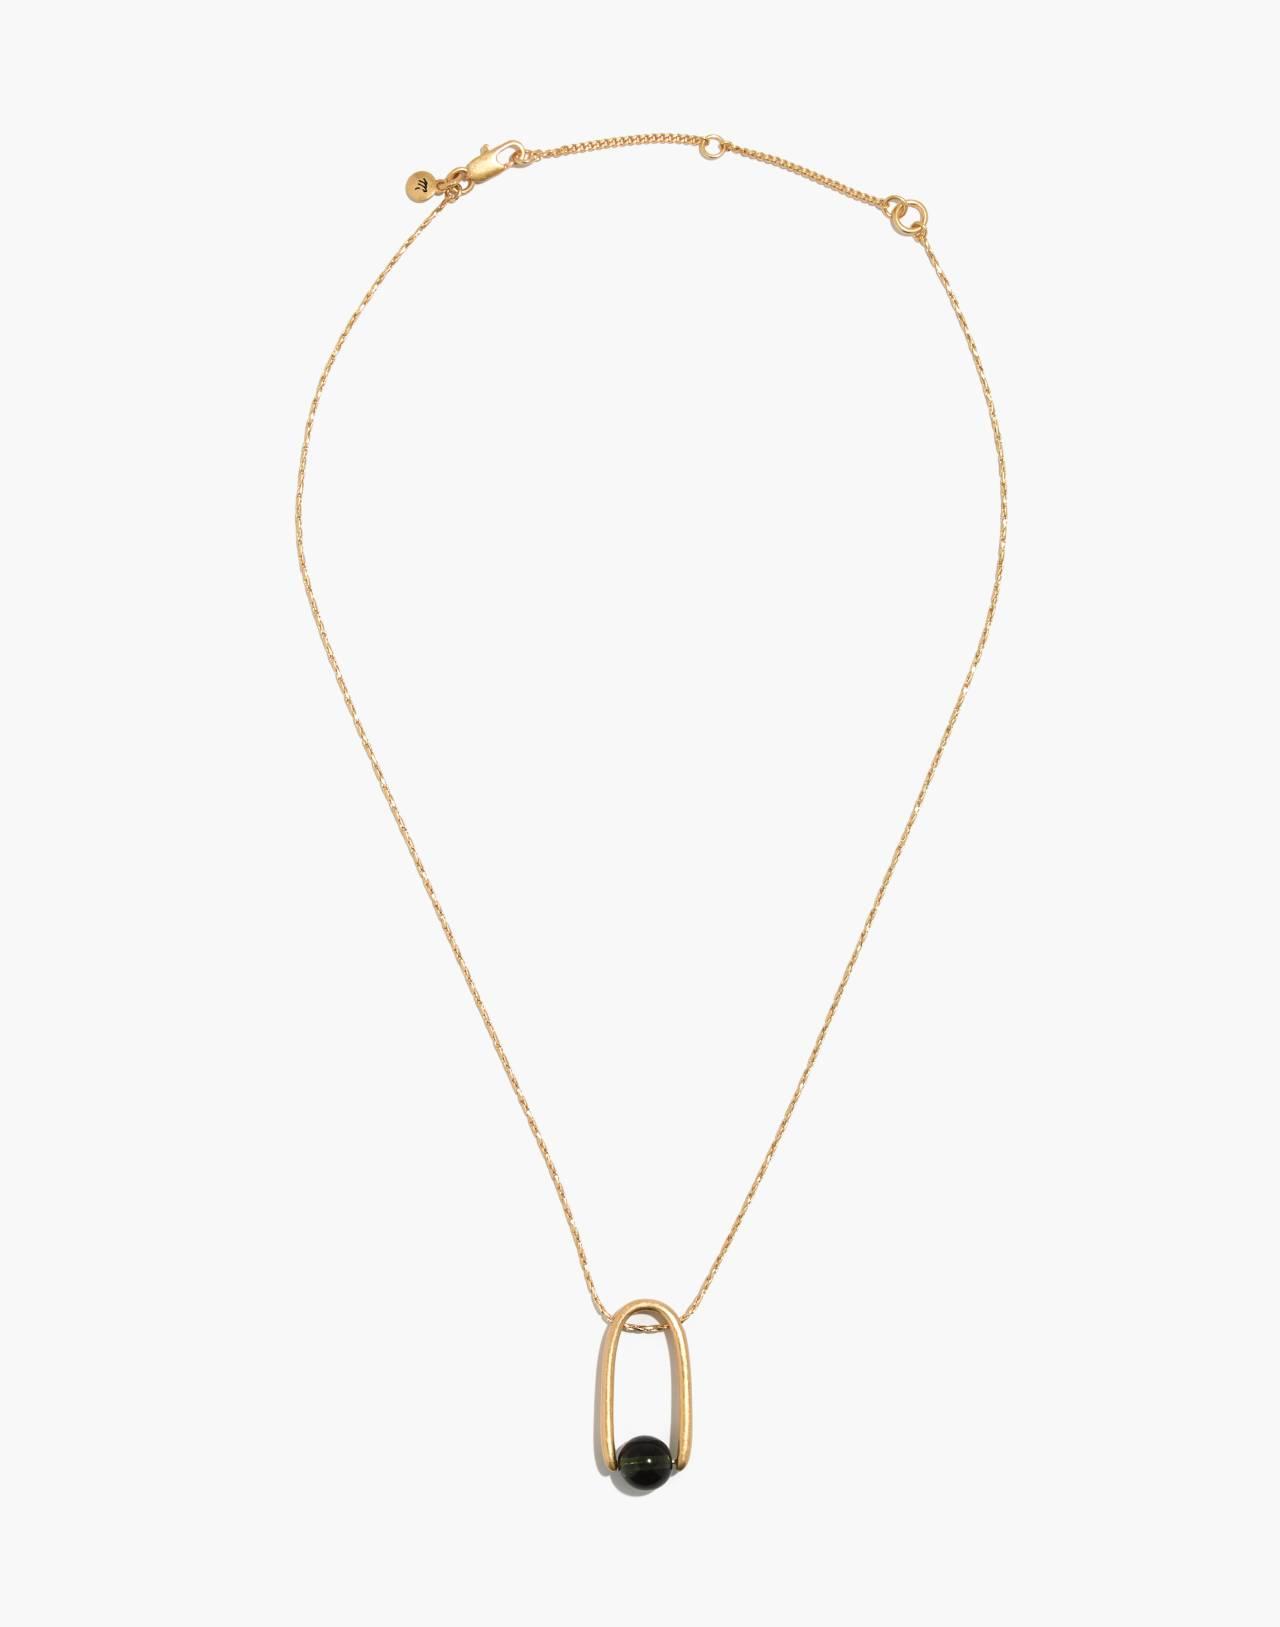 Resin Pinball Pendant Necklace in grandpa image 2